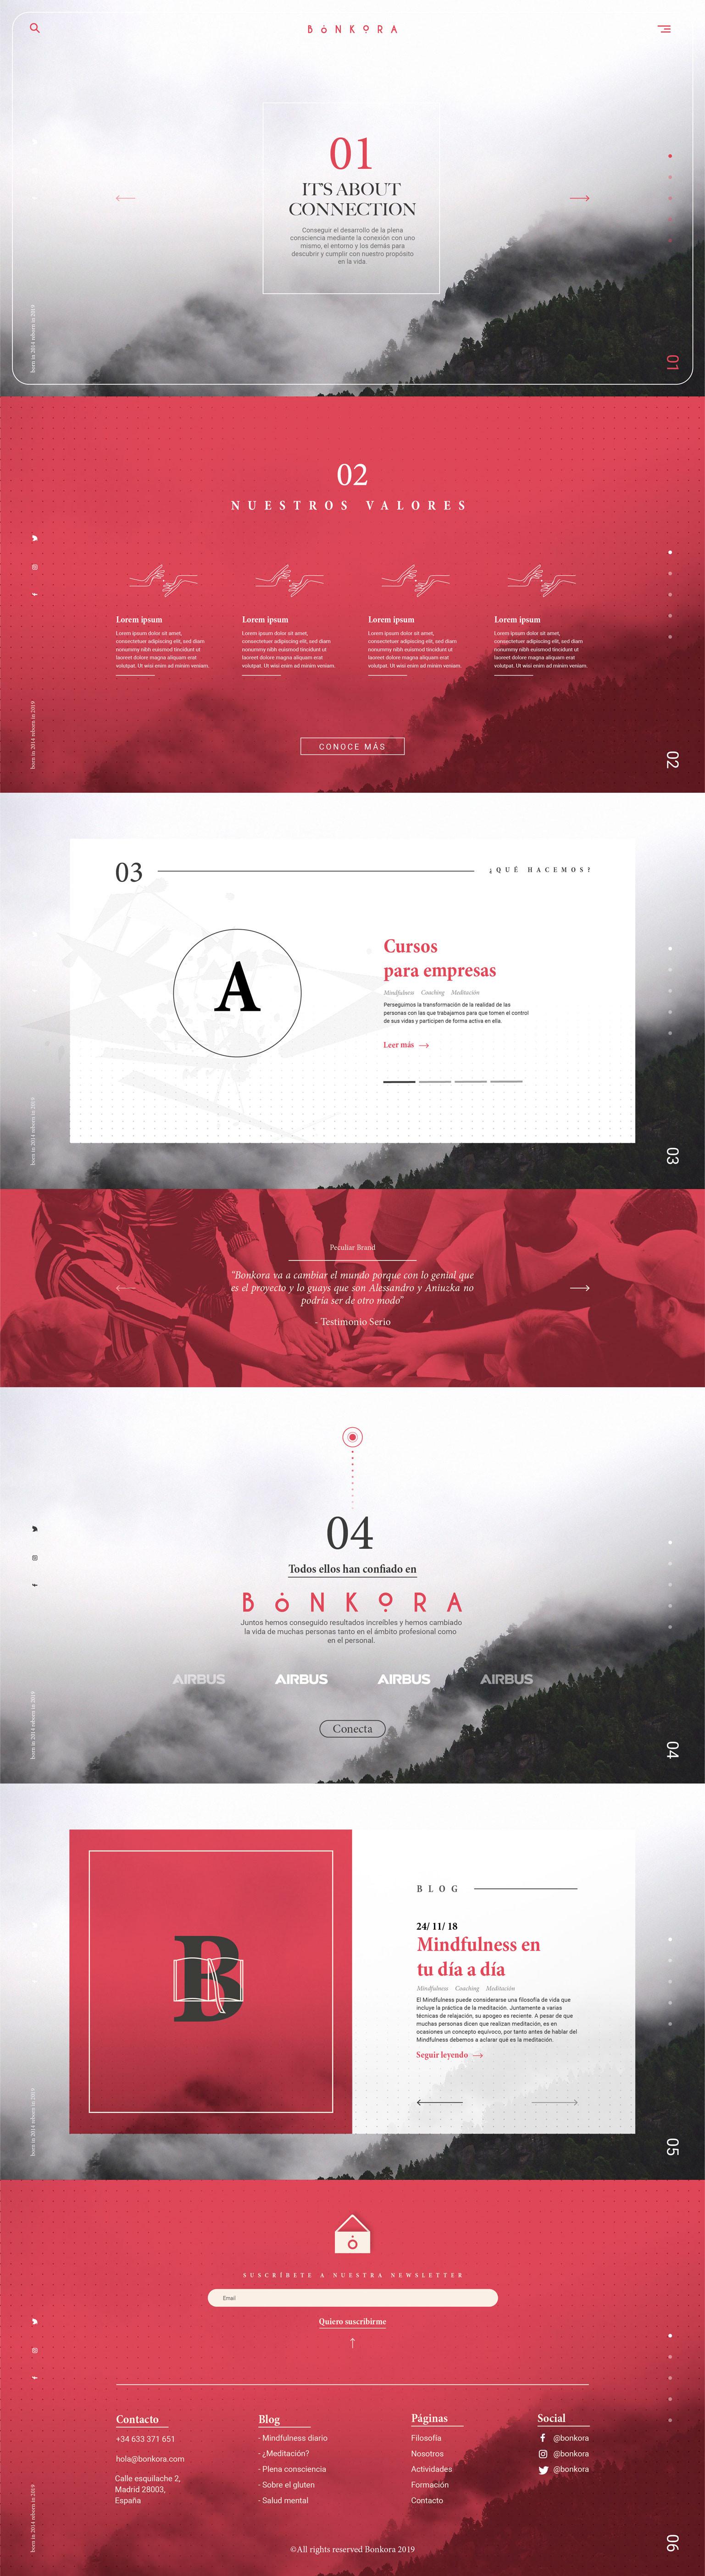 Copia de Web-Bonkora-_Home.jpg